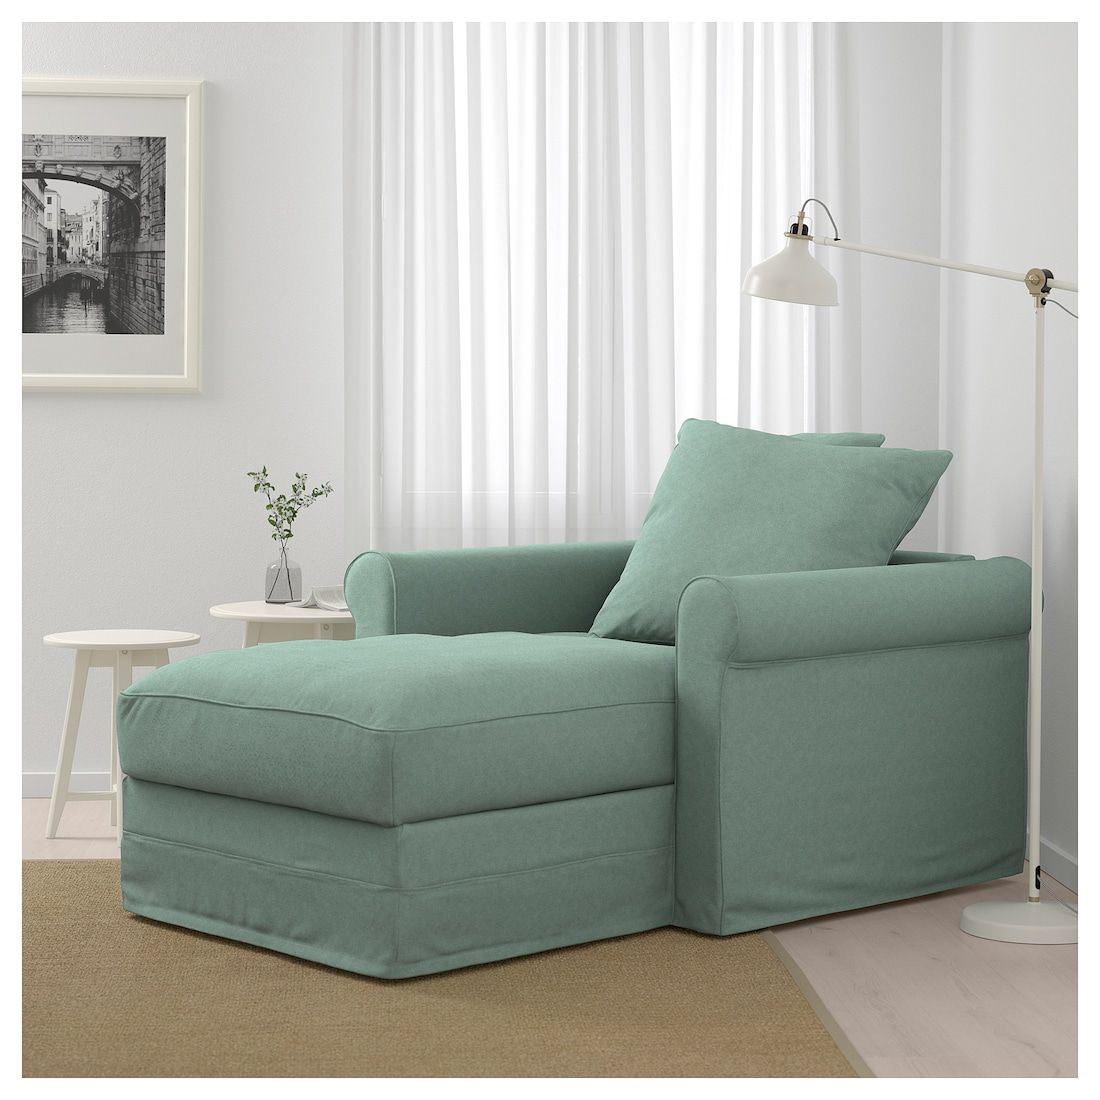 GRÖNLID Tallmyra light green, Chaise longue IKEA Deep